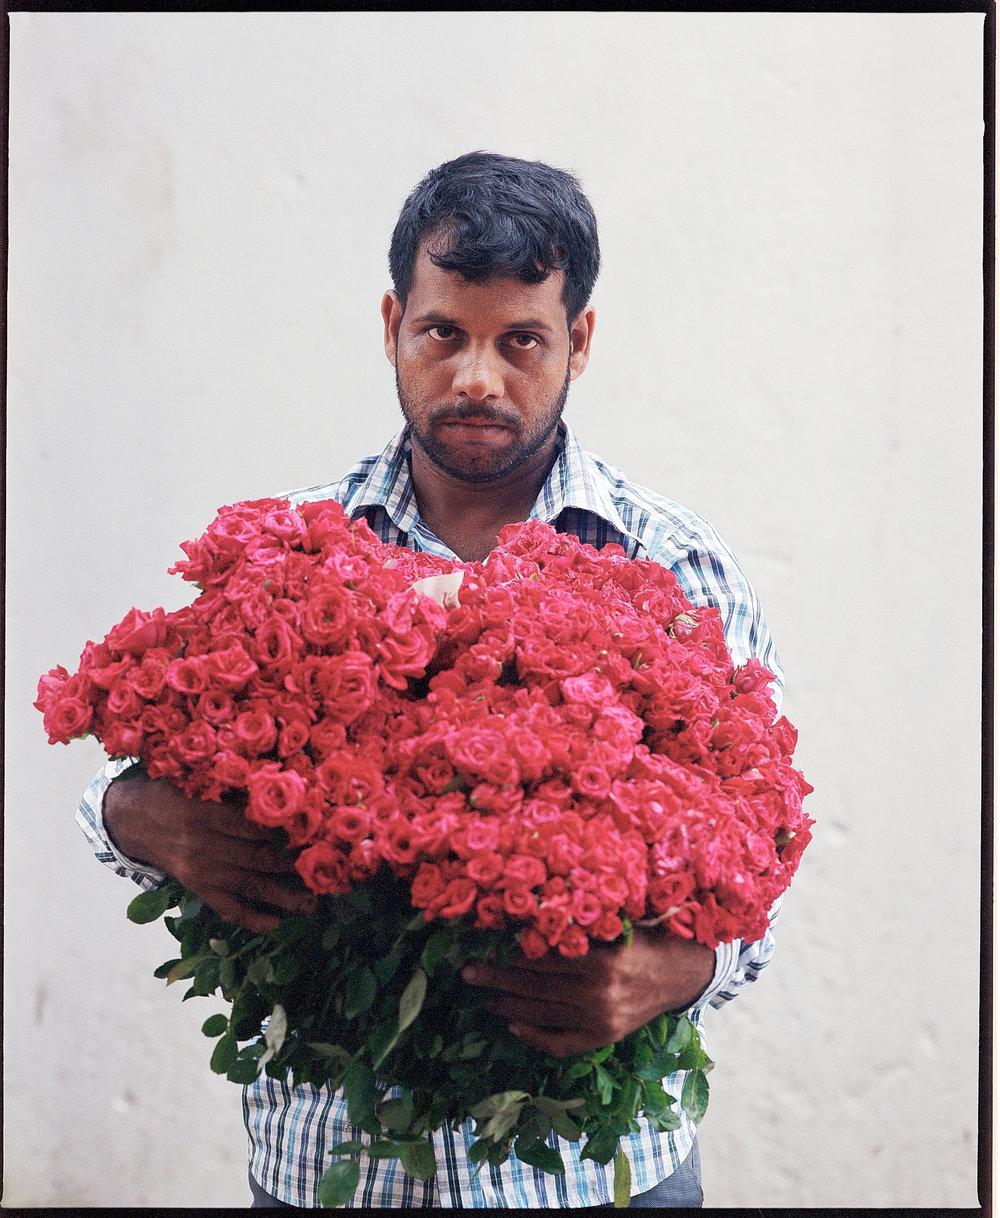 Kolkata_Flowers-15.jpg